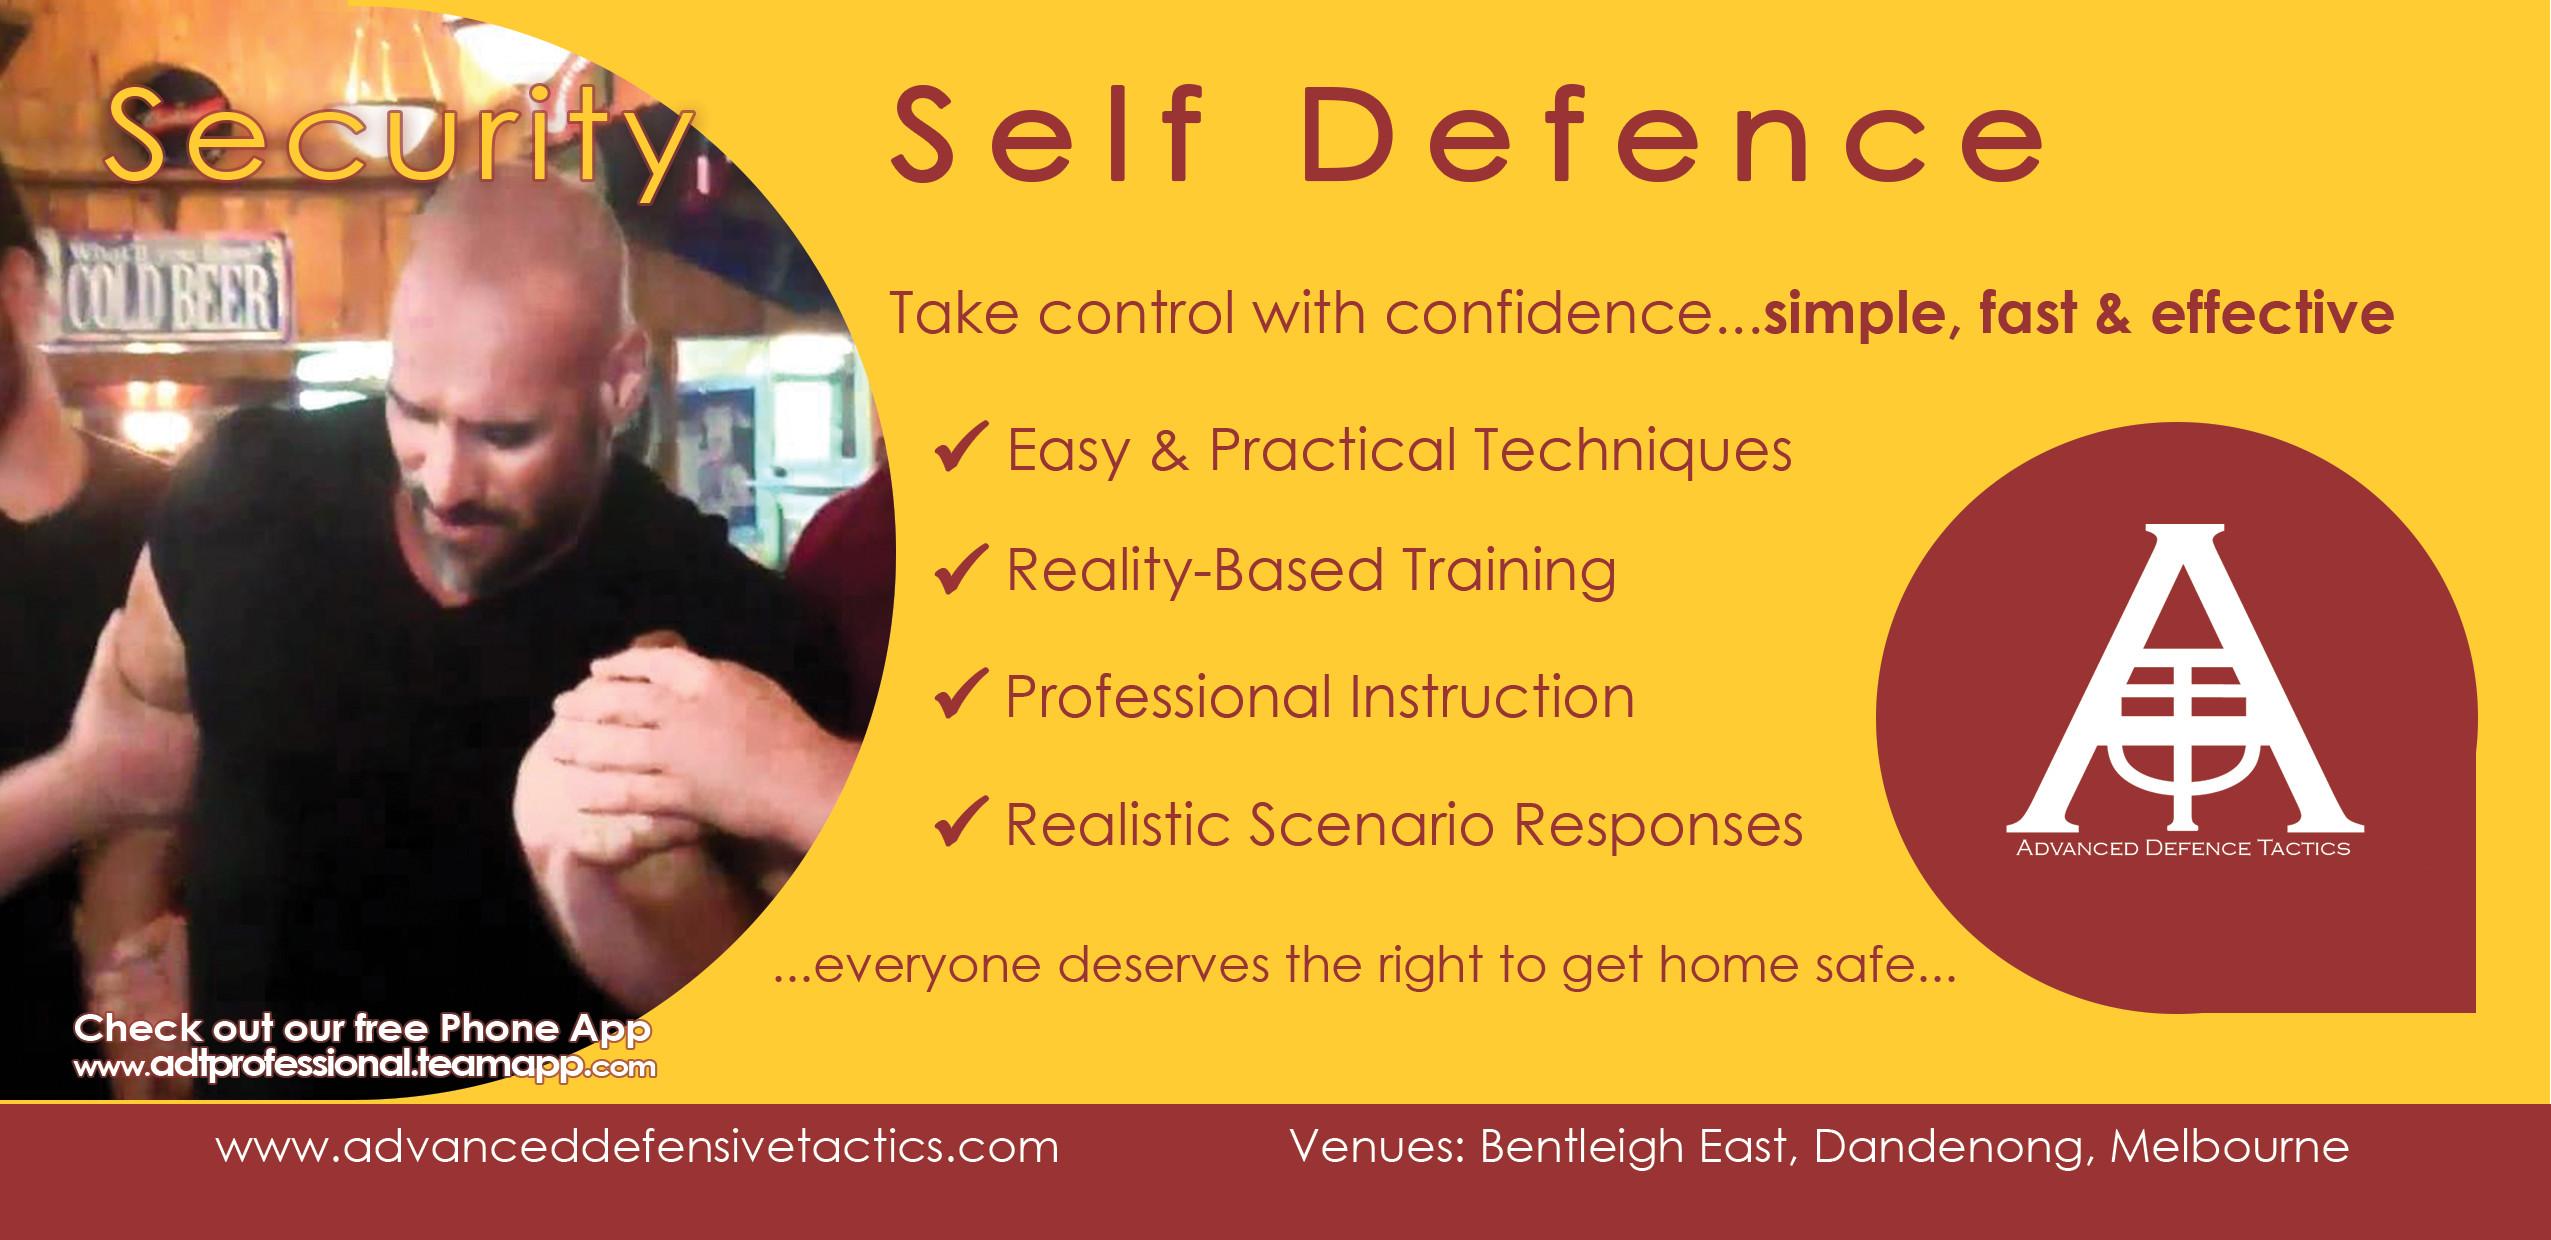 ADT-Professional Self Defence